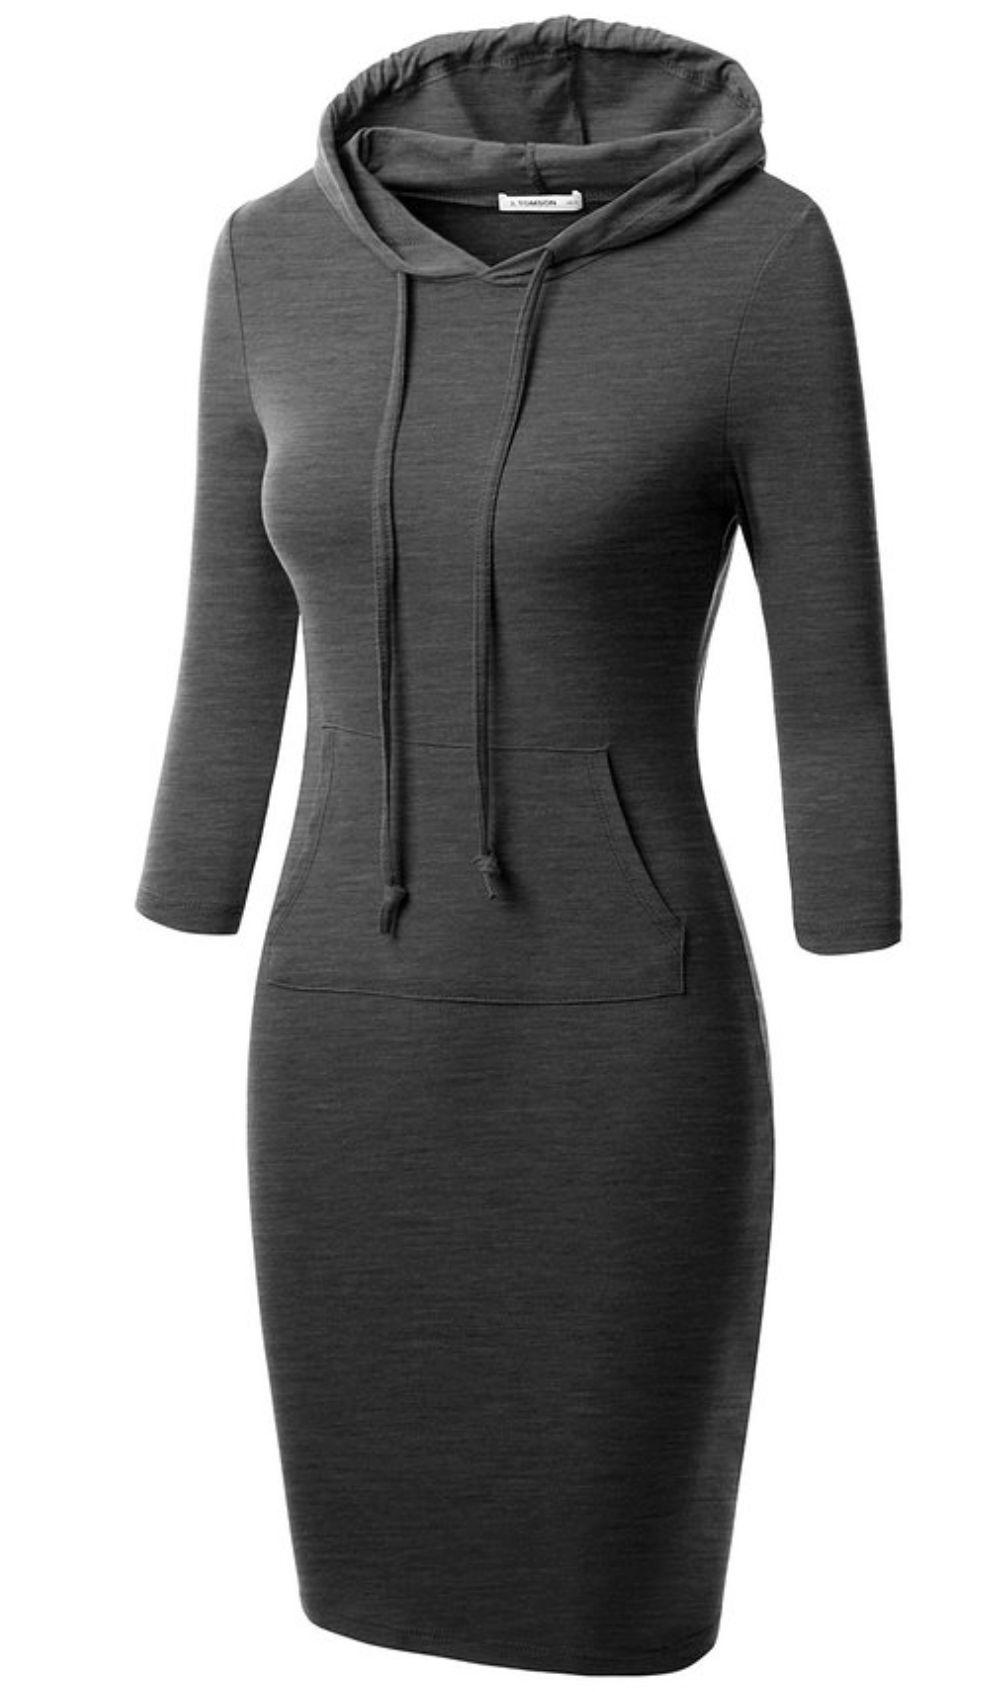 Women's Bodycon 3/4 Raglan Sleeve Hoodie Dress with Kangaroo Pockets